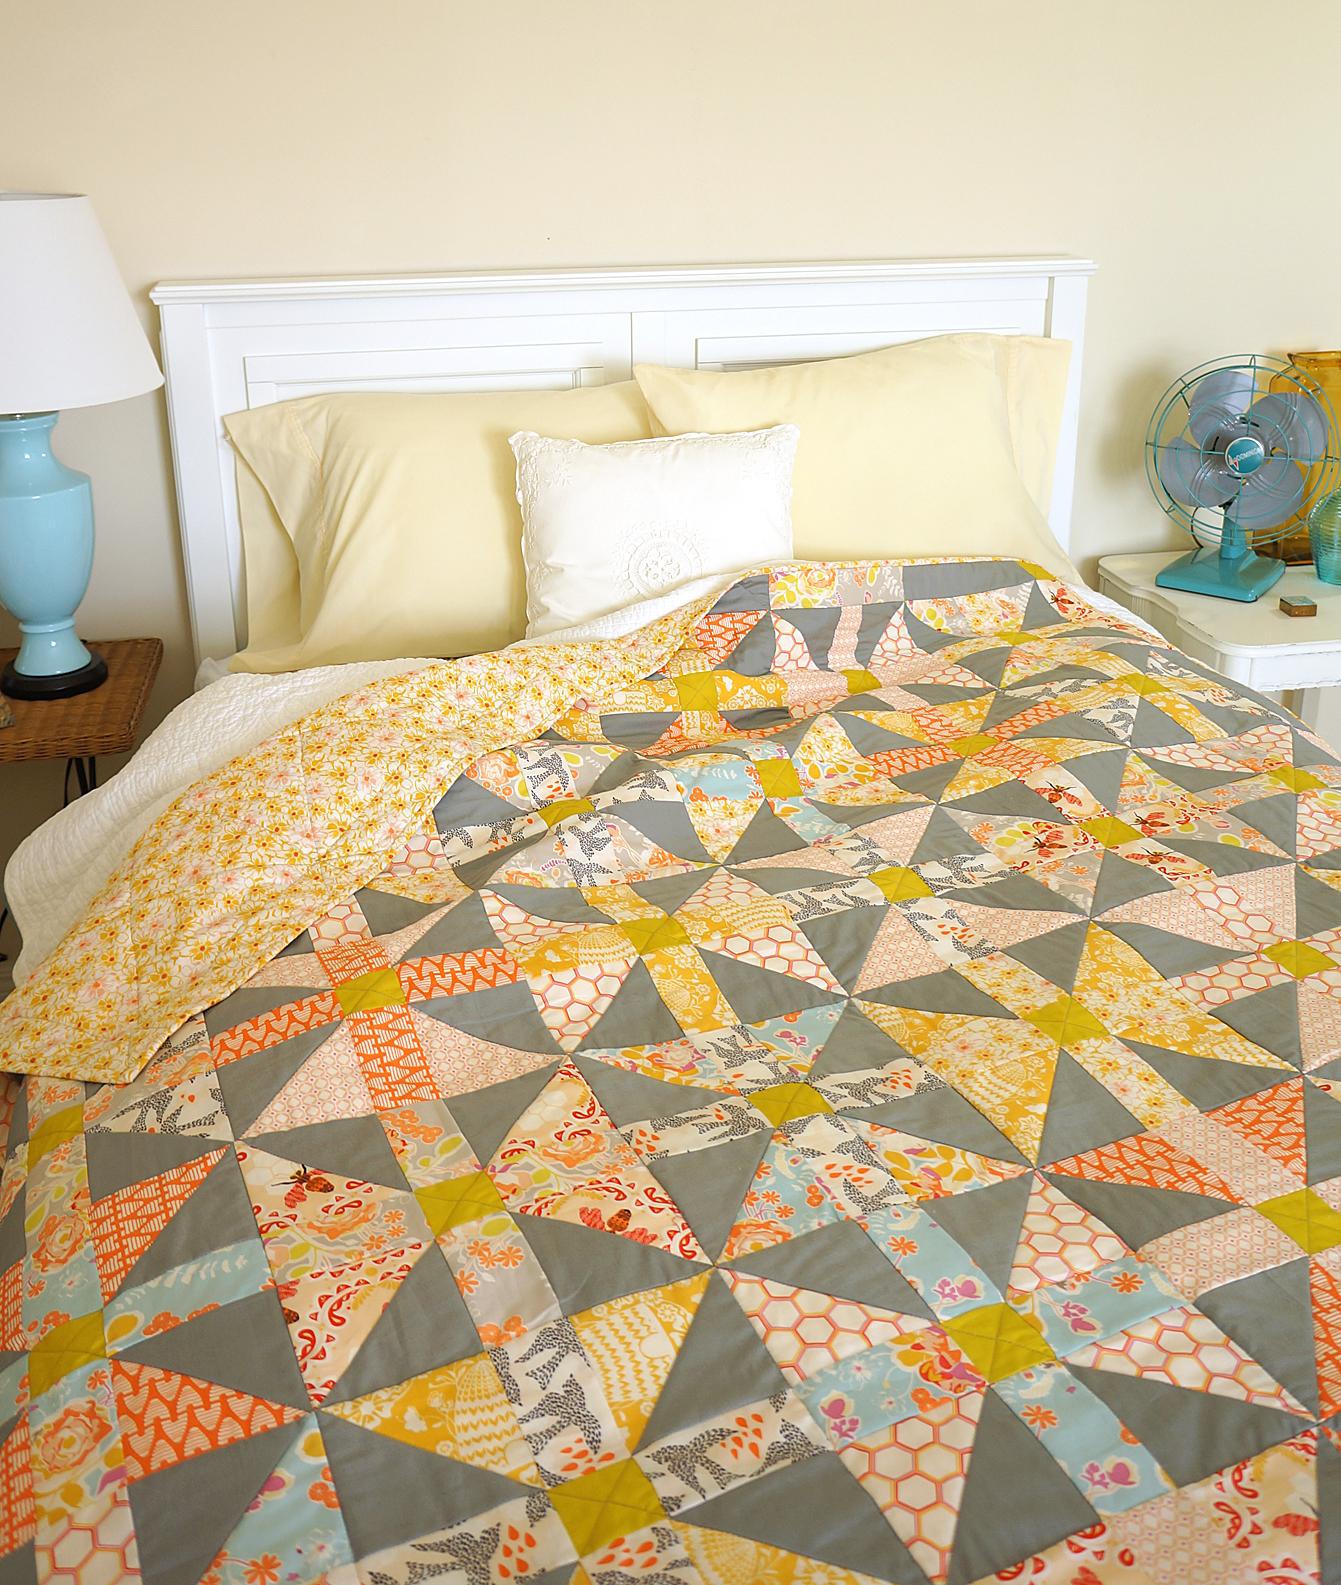 Honeybee Cottage quilt by Sharon Holland Designs